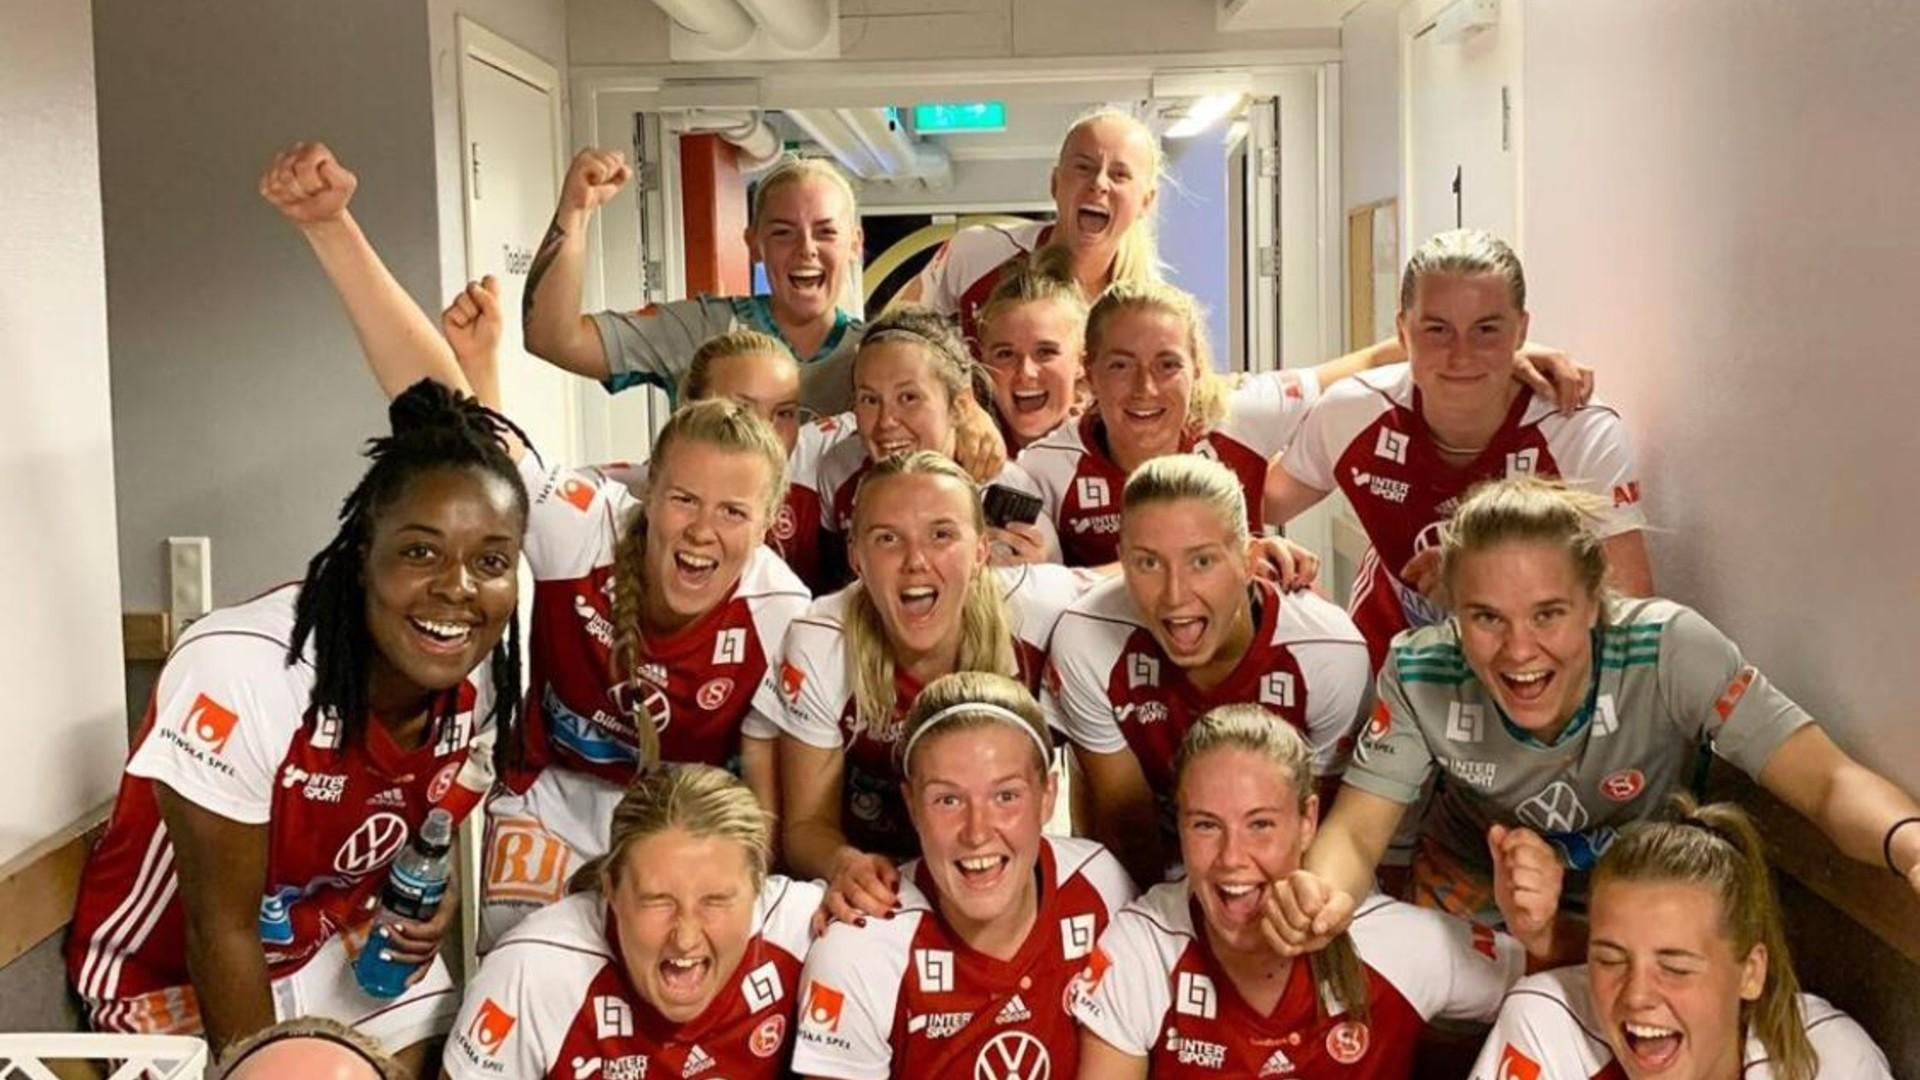 Nigeria's Okeowo and Burundi's Nduwimana endure mixed fortunes on debuts in Sweden